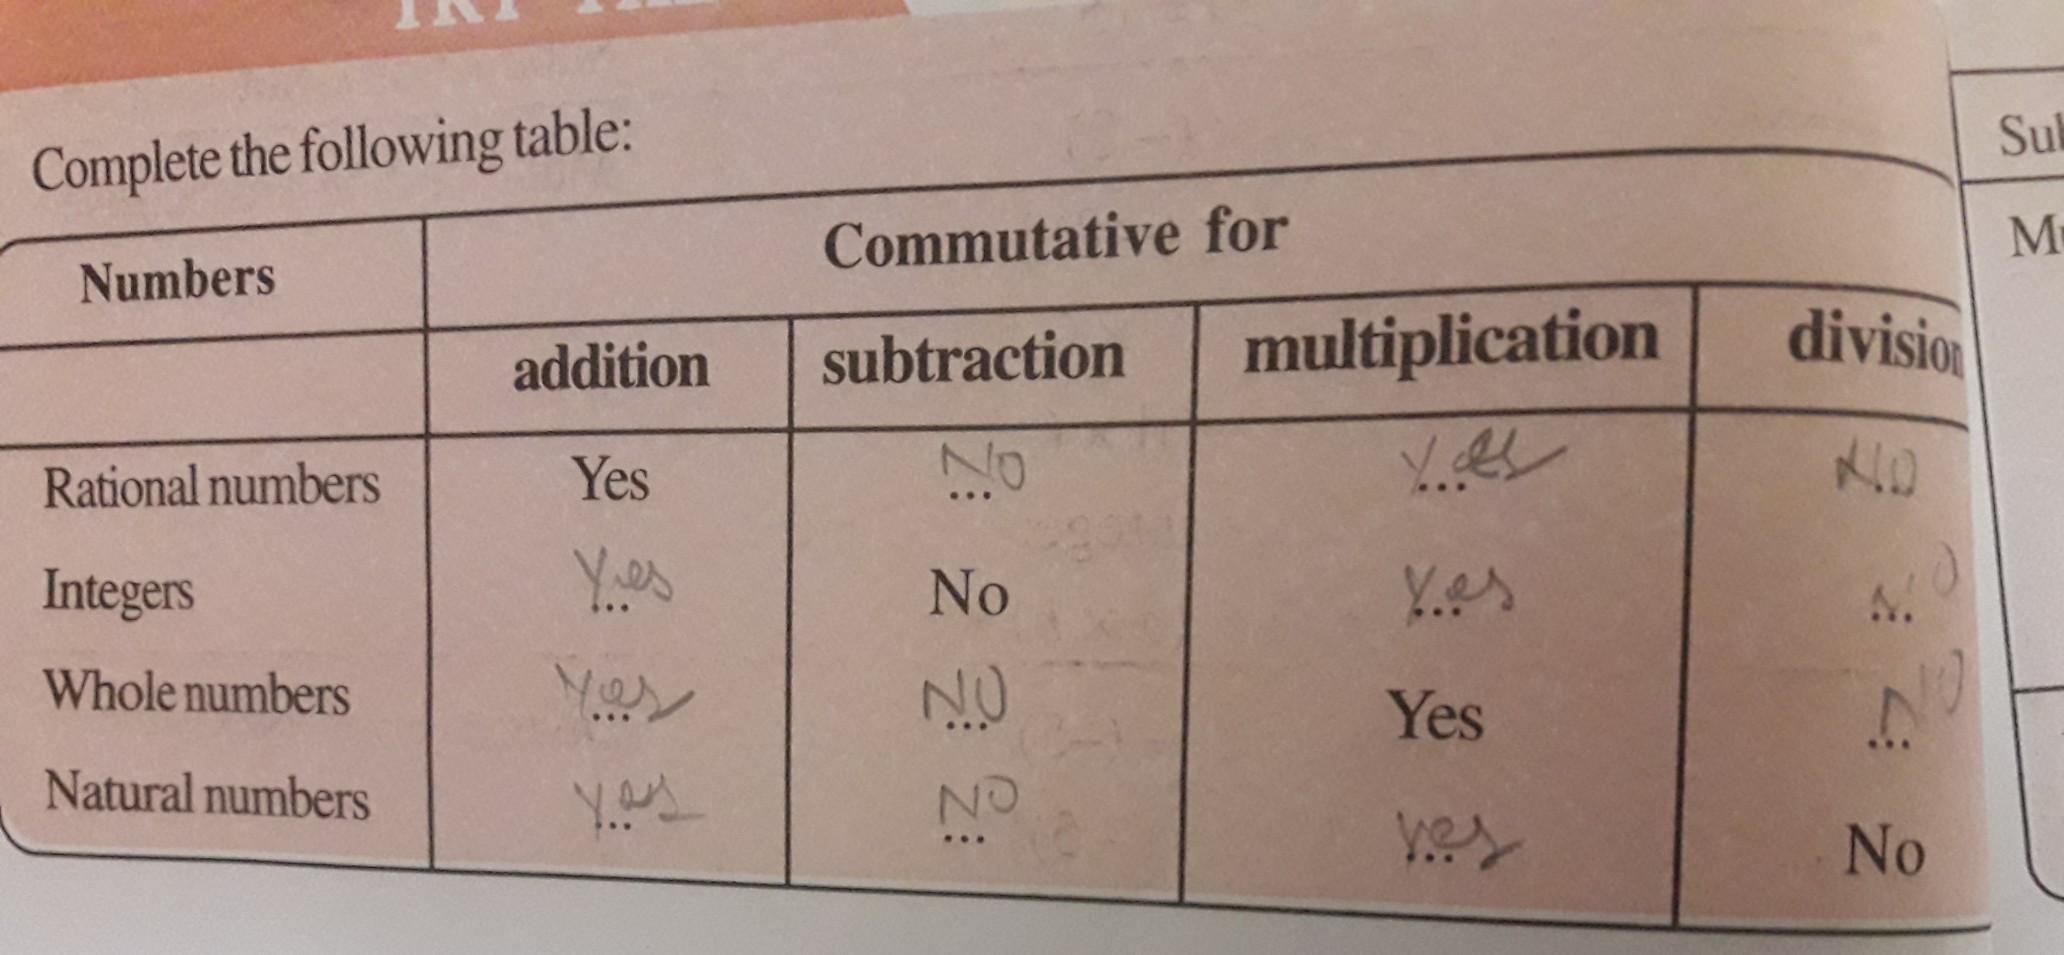 prepare a table for closer property, commutative property